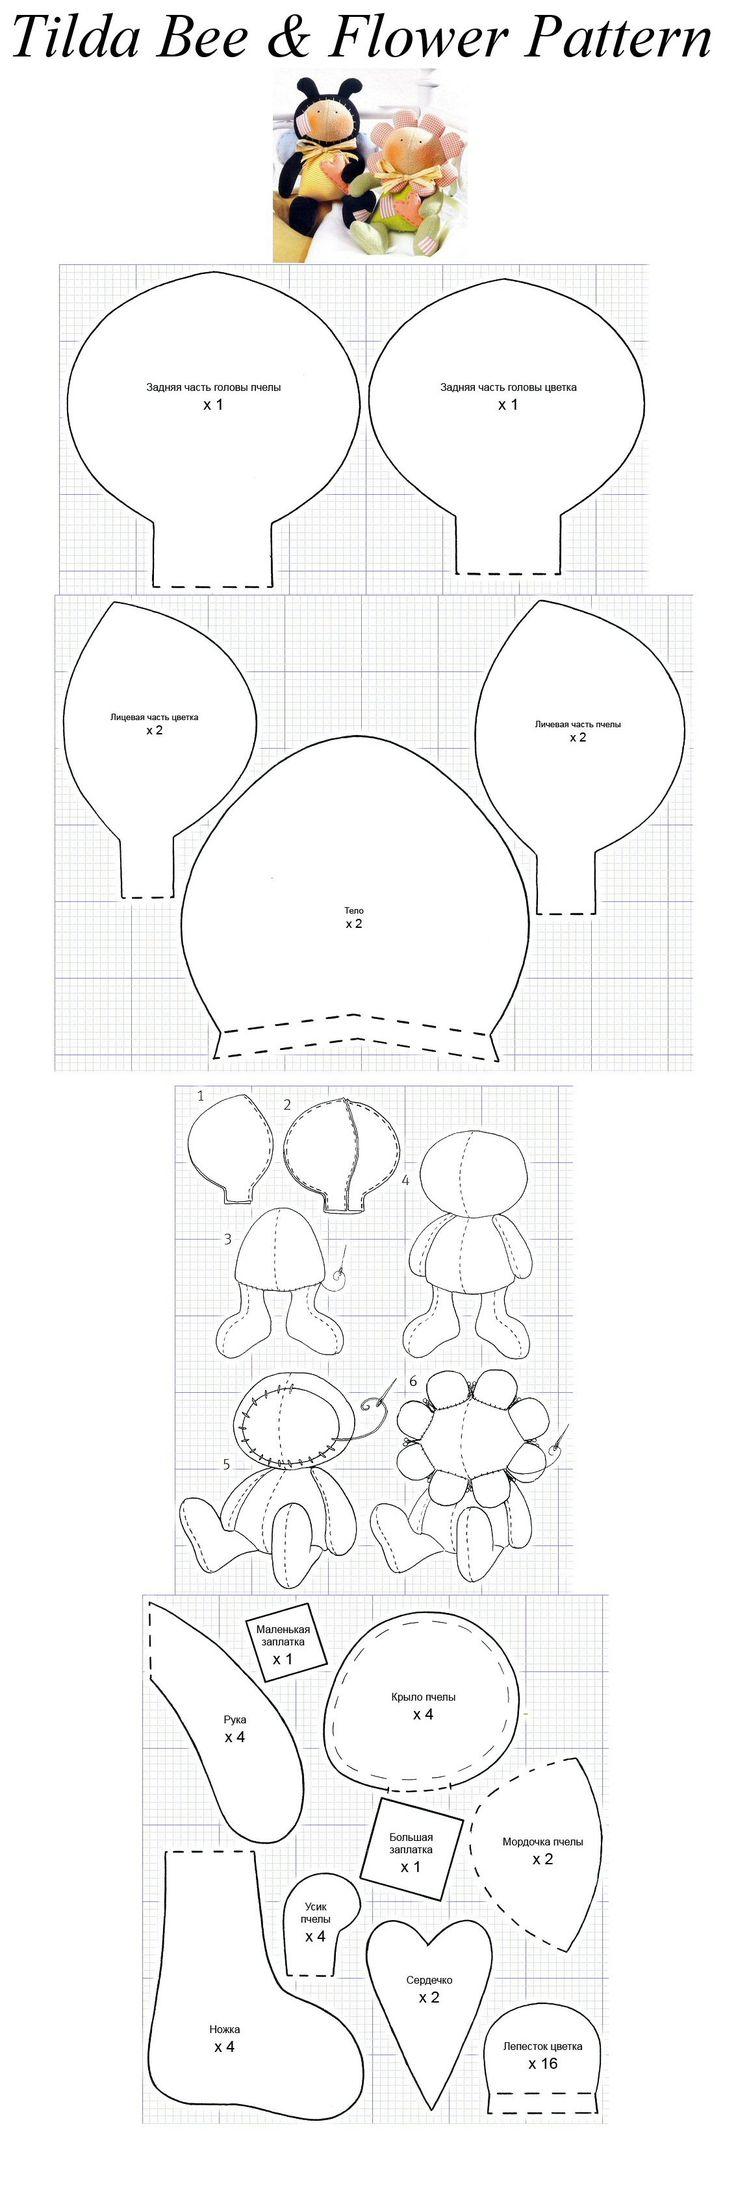 Tilda Bee & Flower Pattern